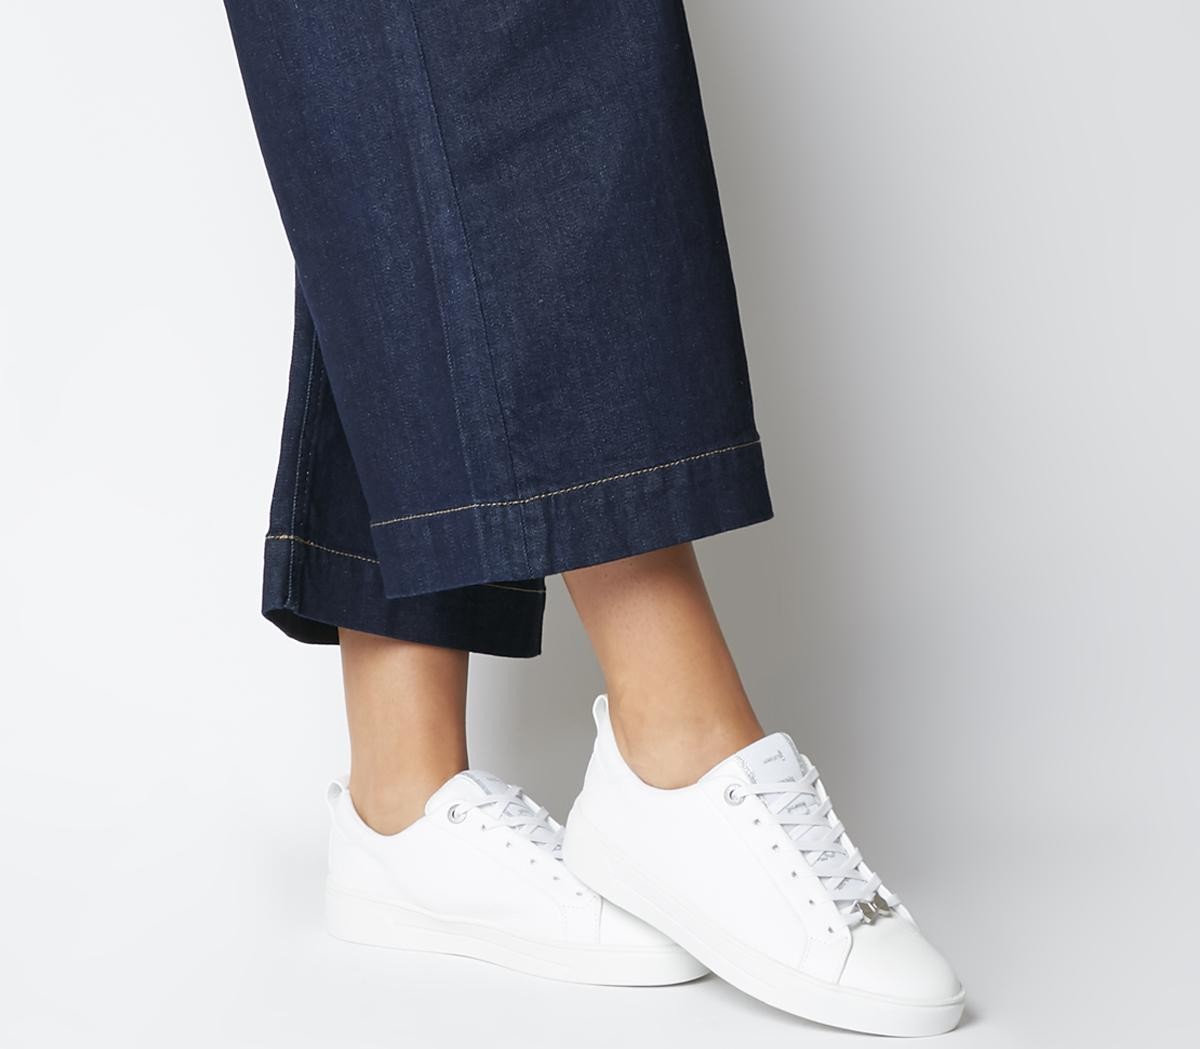 Ted Baker Tedah Sneakers White